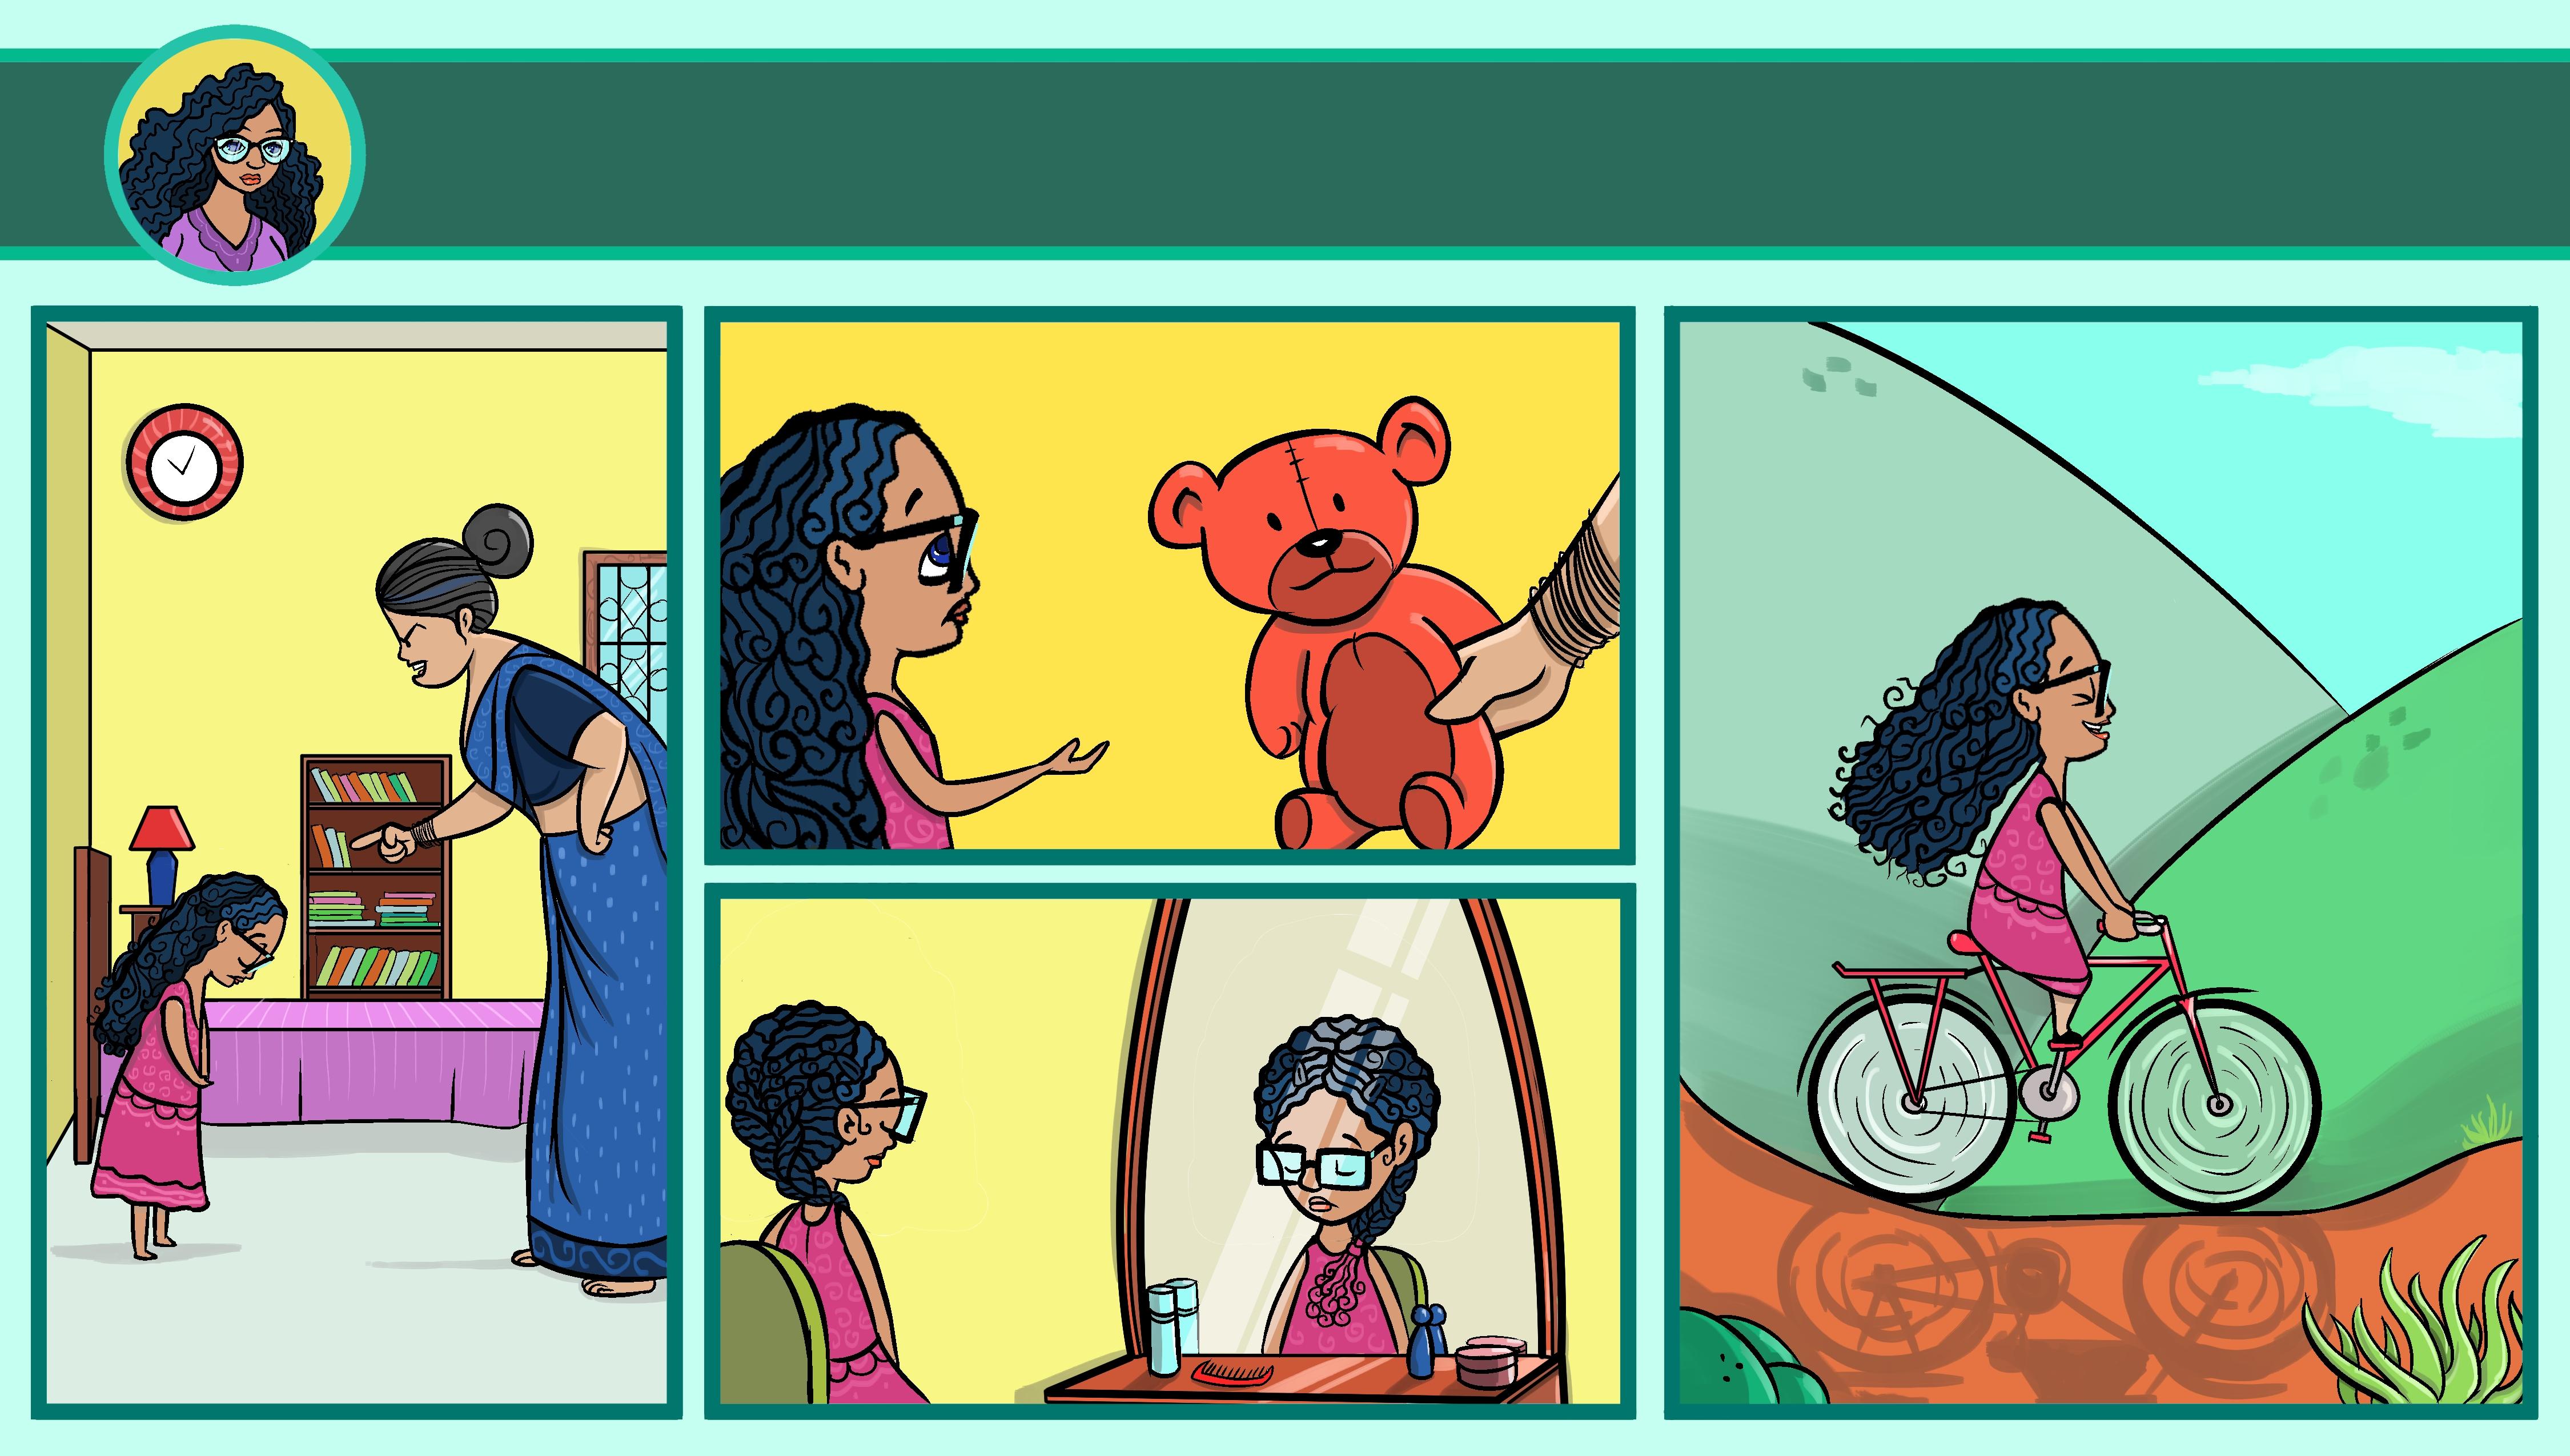 Bangladesh-comic-Dhee